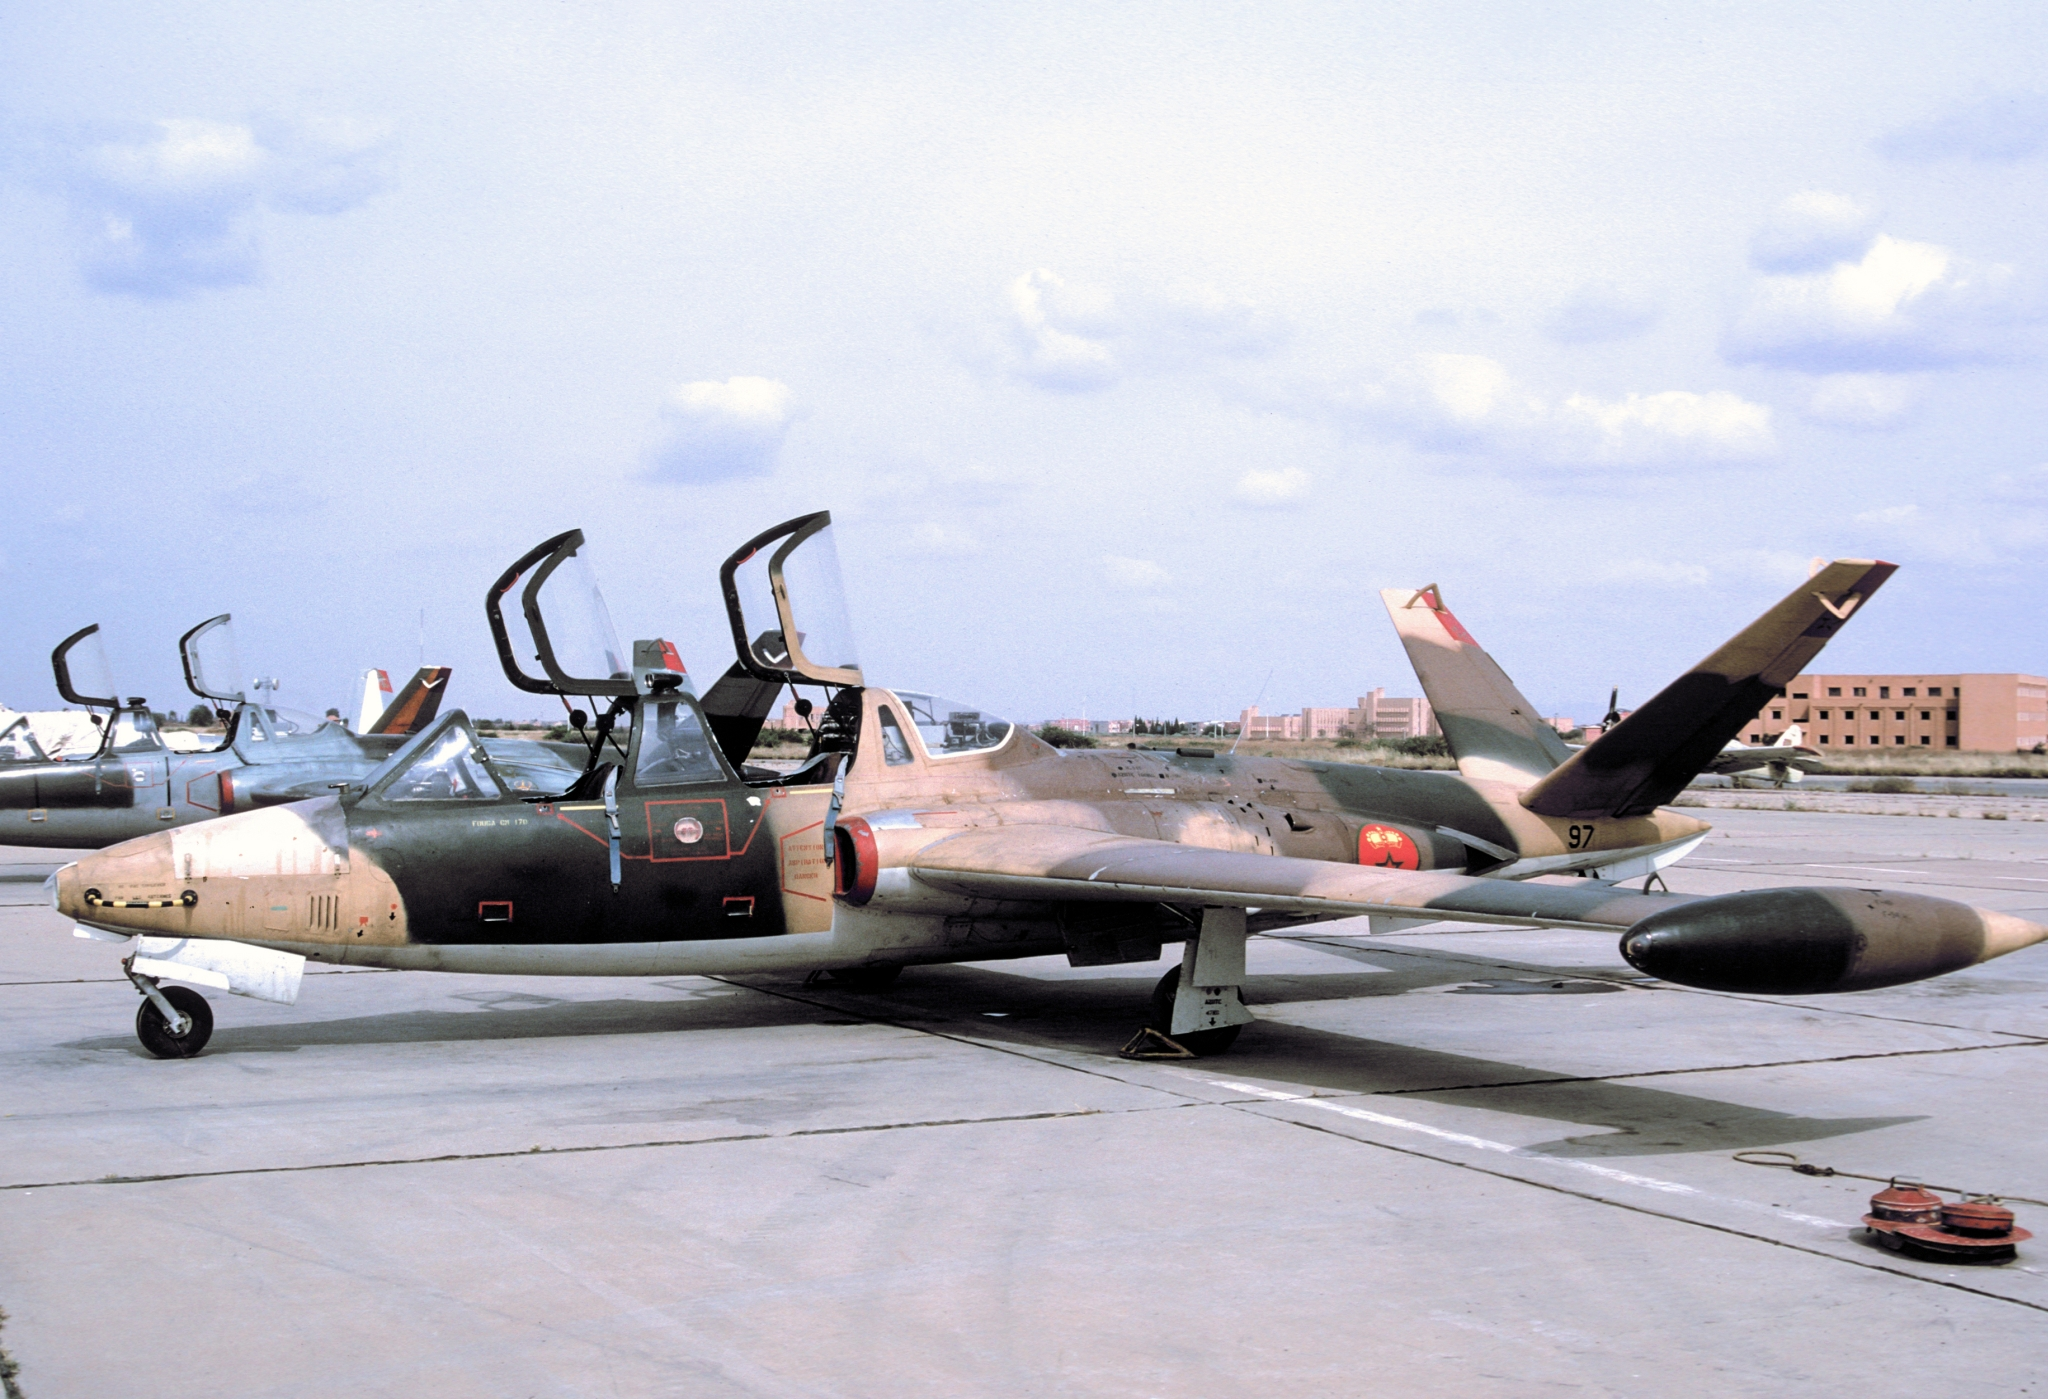 FRA: Photos anciens avions des FRA - Page 13 46519402721_10bfc55b91_o